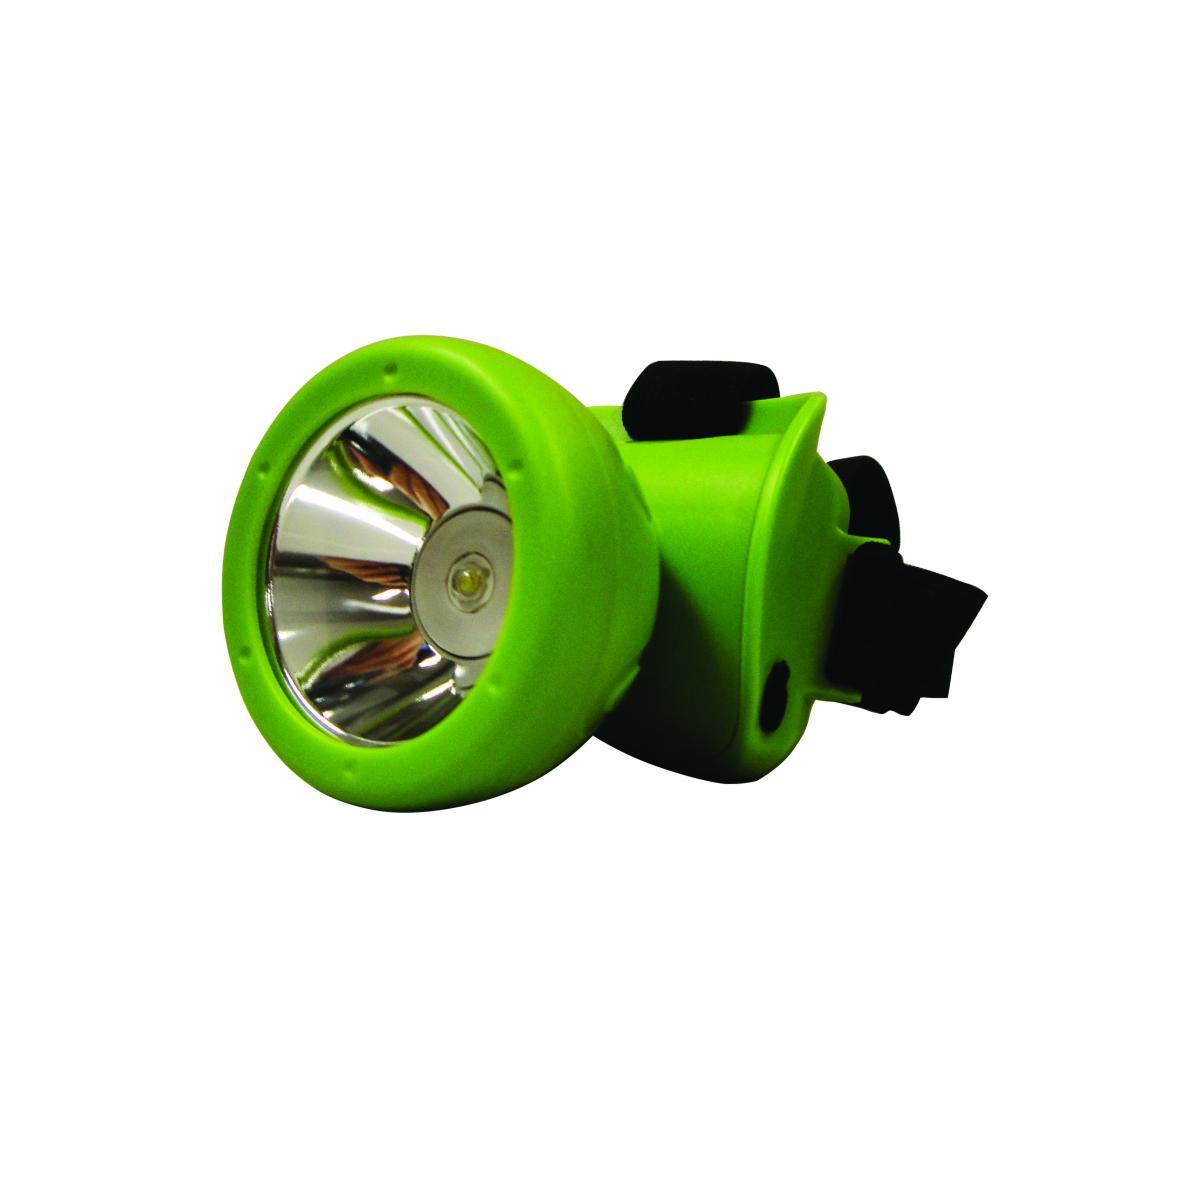 Led Light Torche frontale 1W LED - LED Light